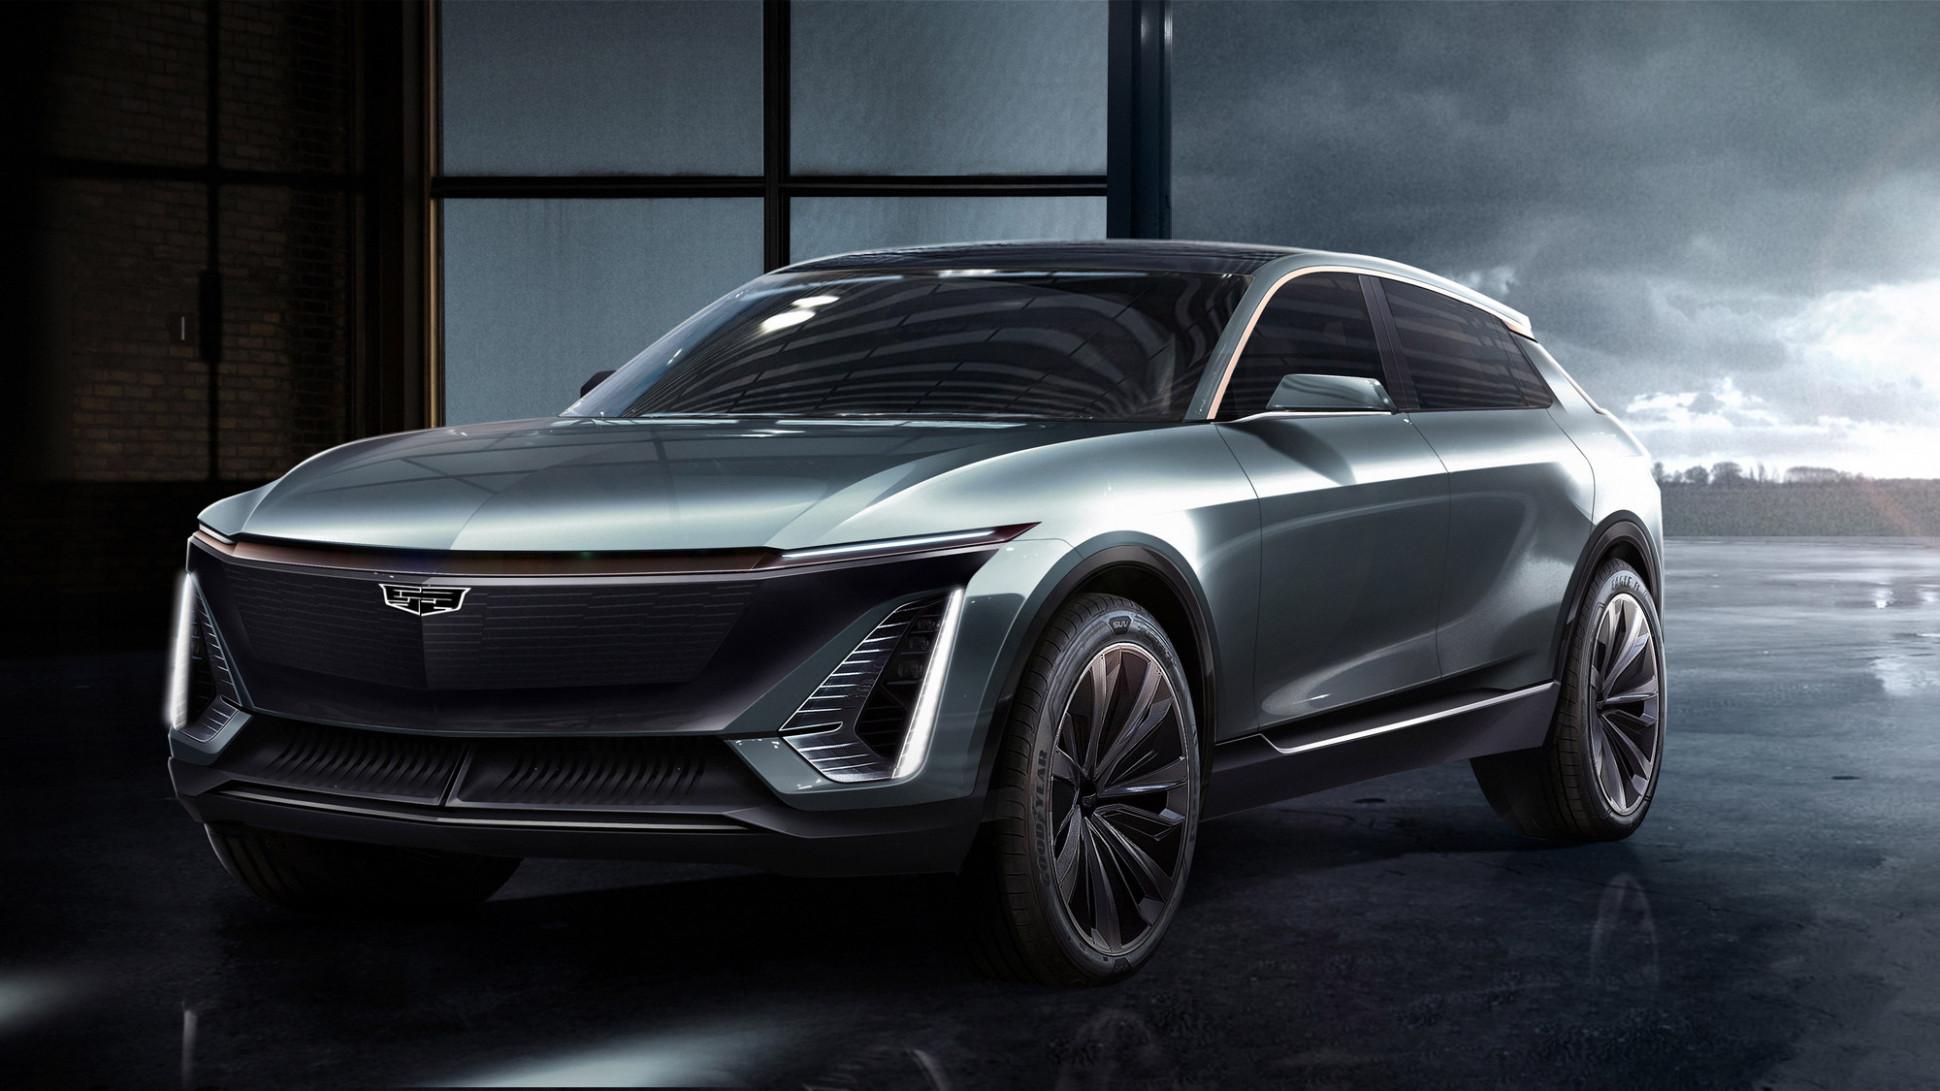 Performance 2022 Buick Enspire